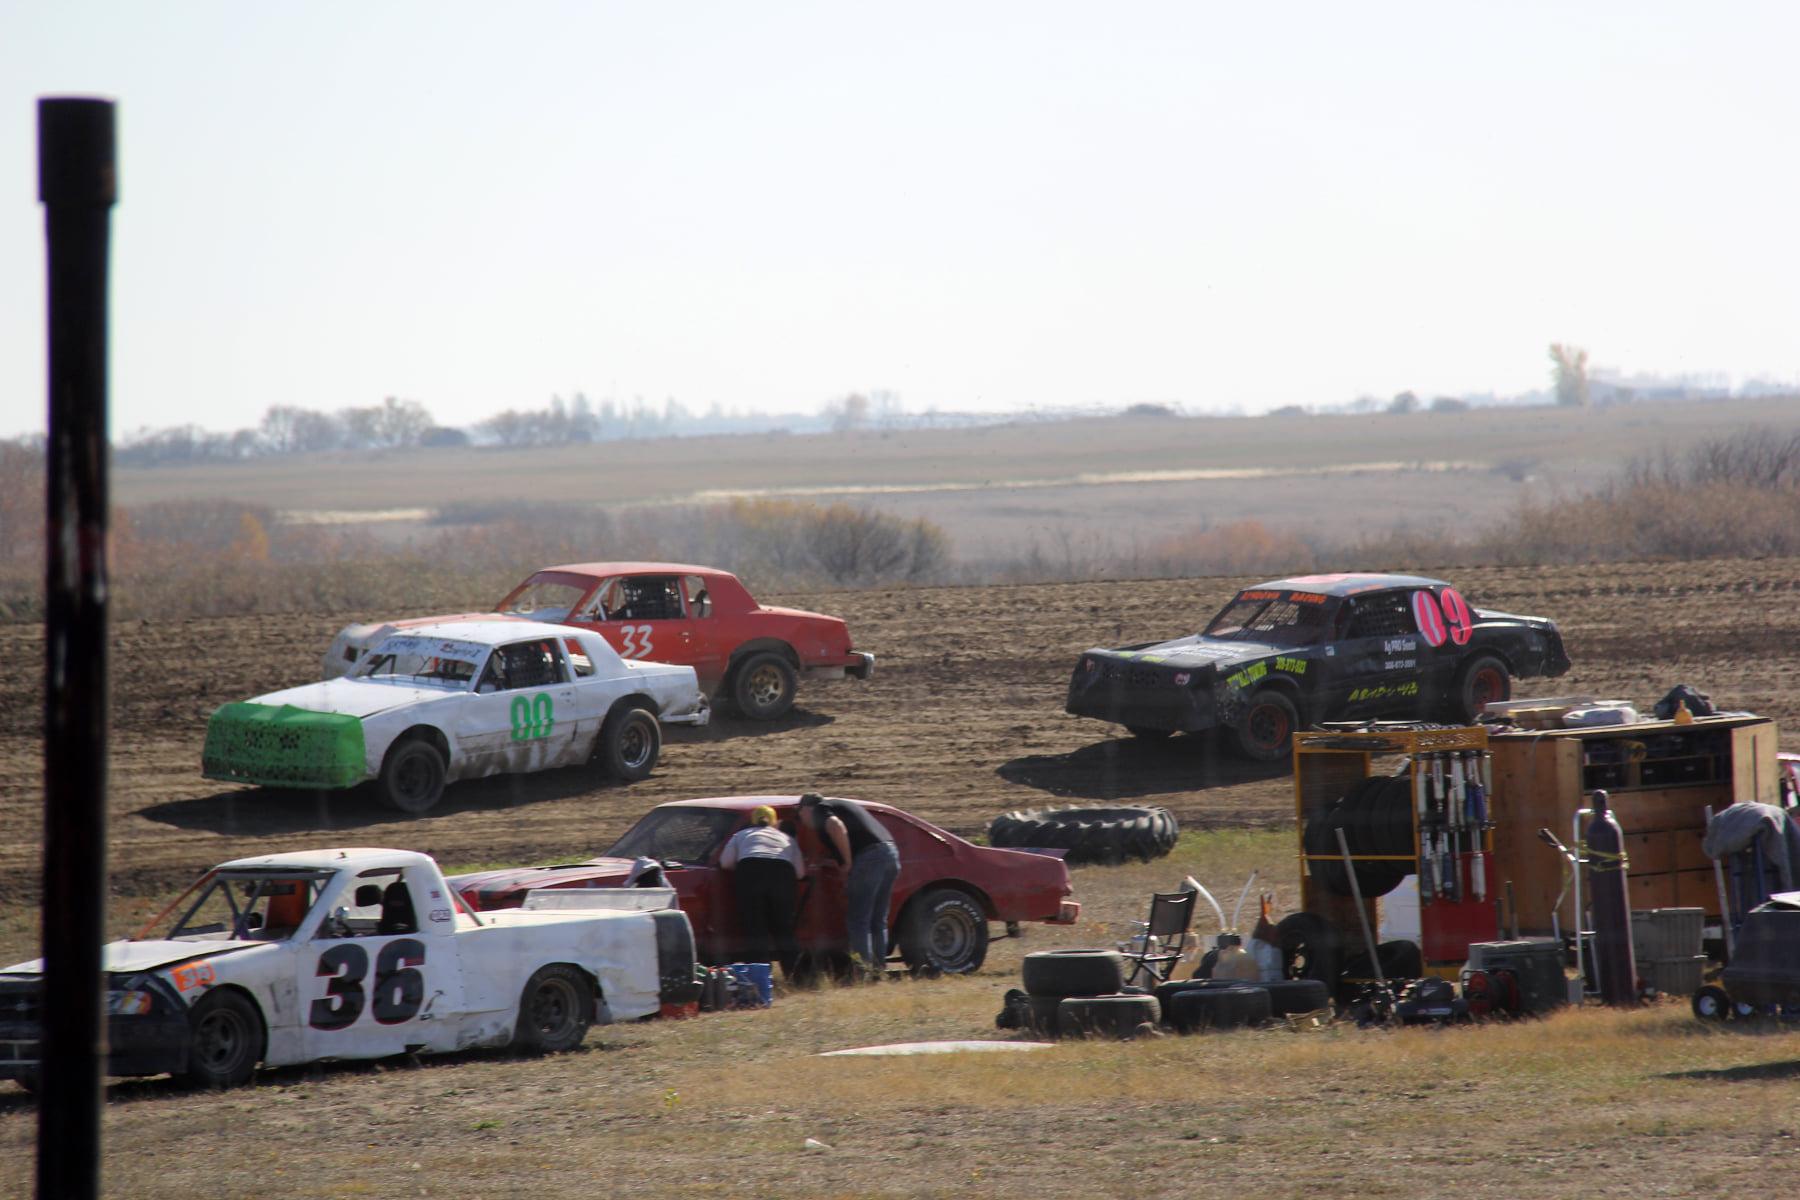 Outlook_Racing_Kemmer_Racing_Photography_1.jpg